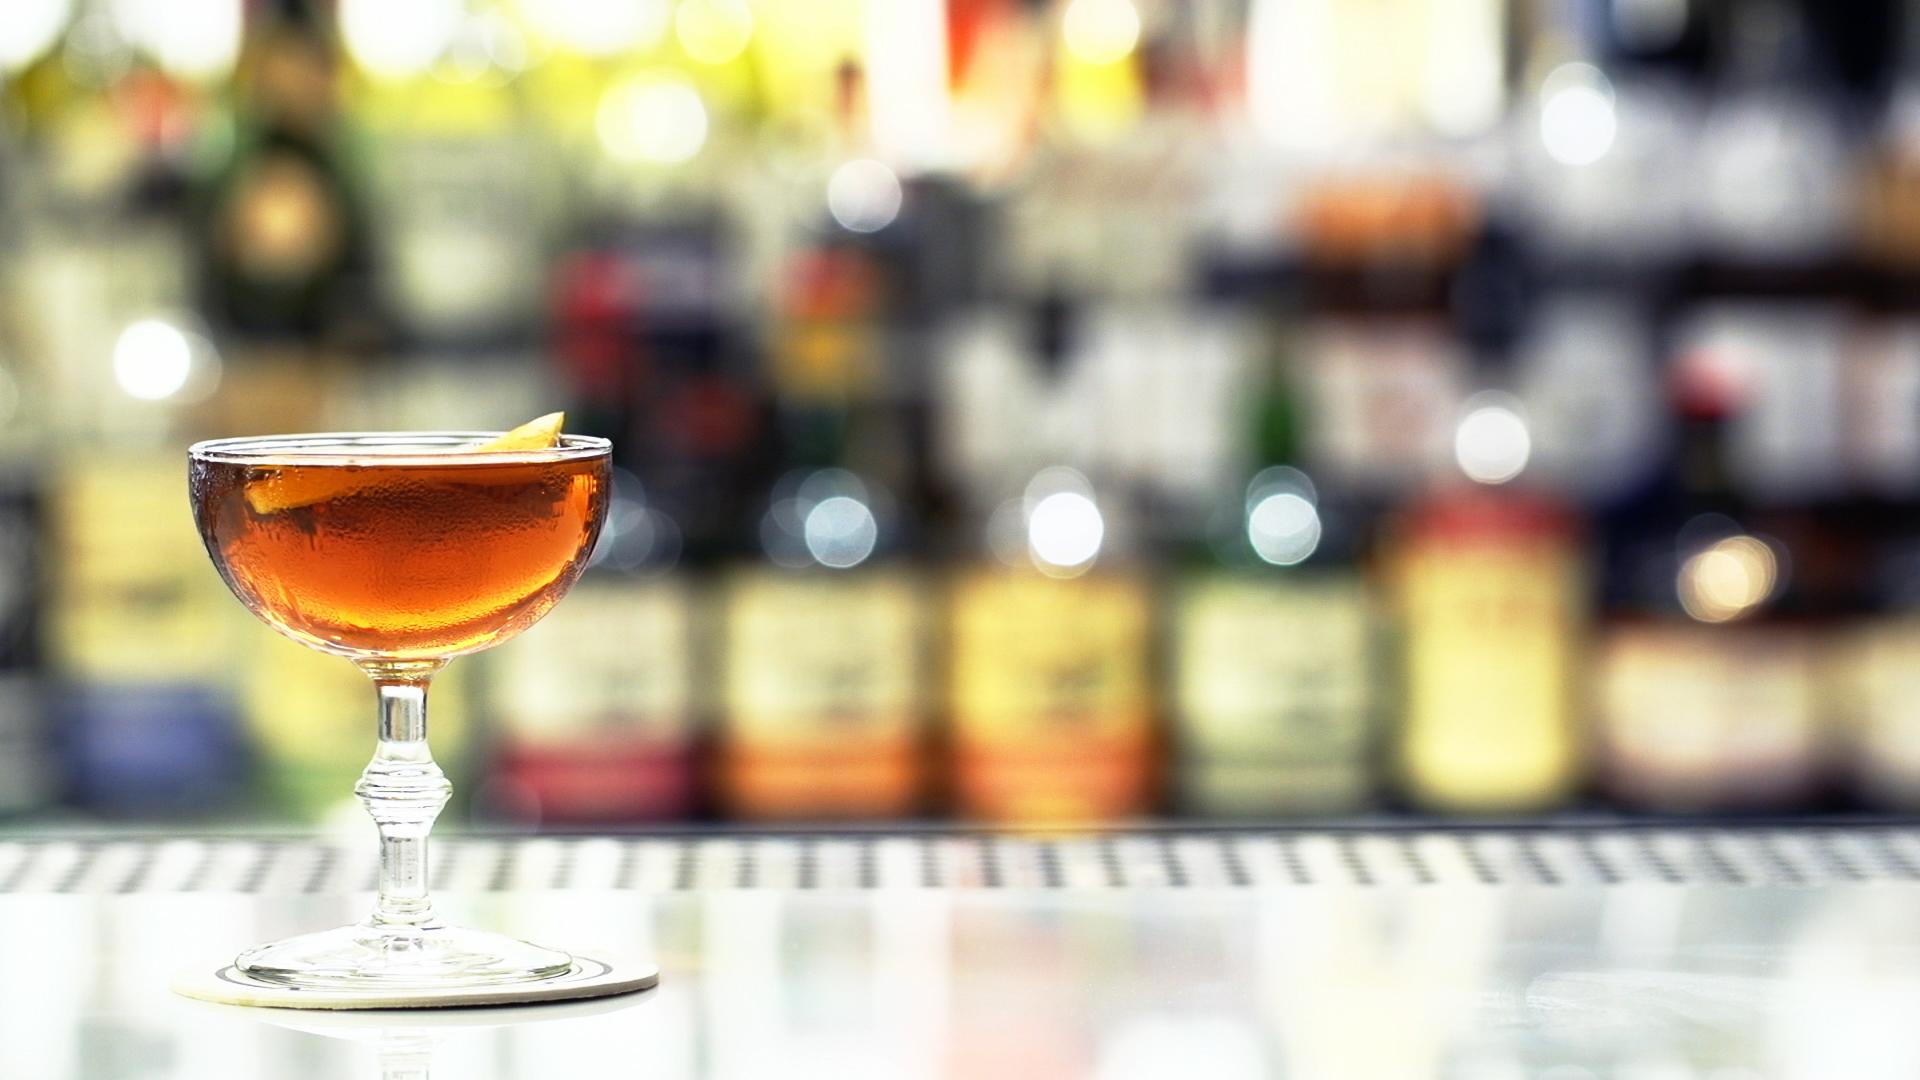 skurnik-cocktail-series-martinez